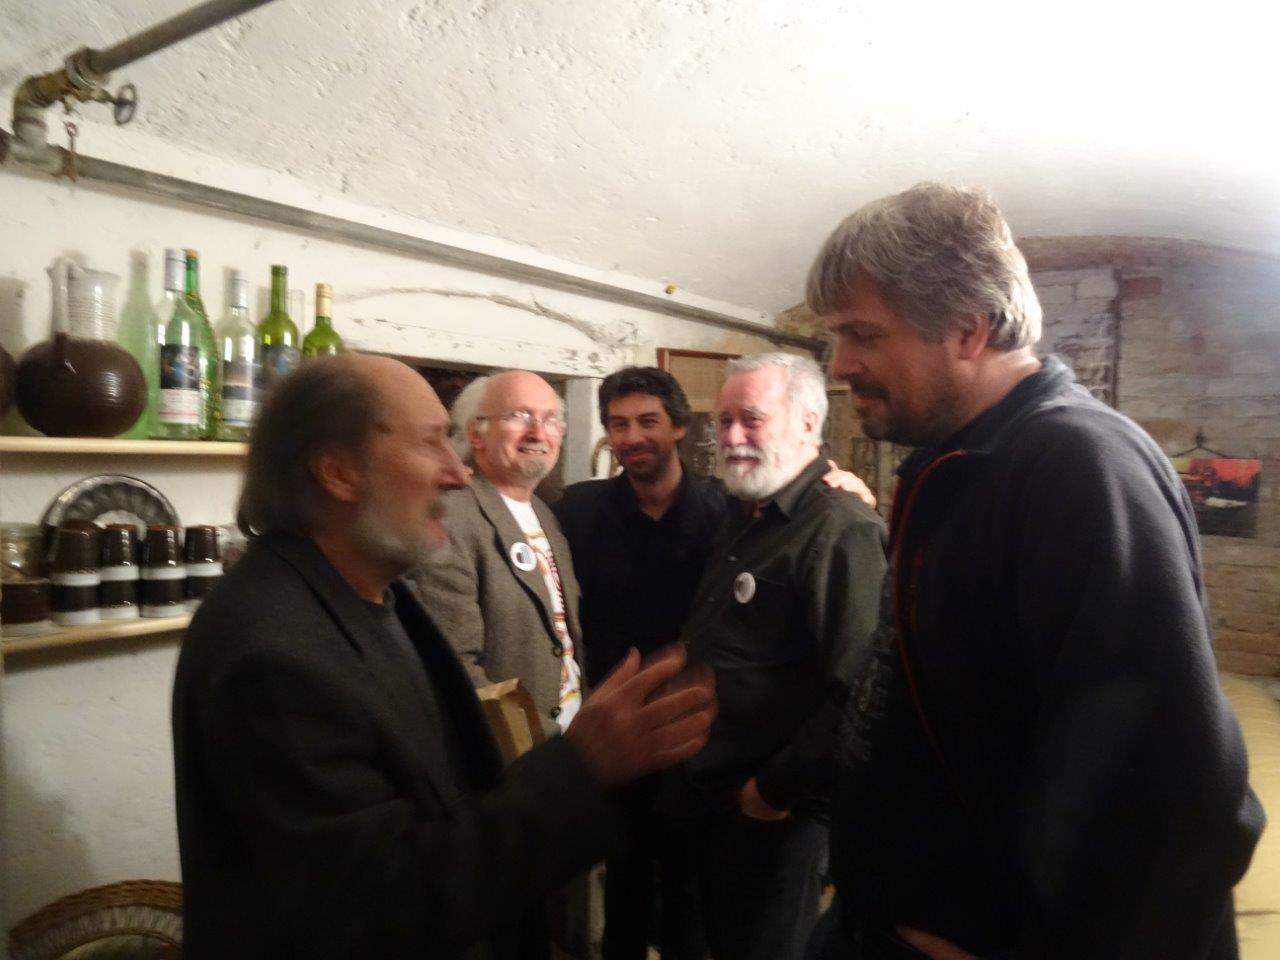 Dušan Junek, Jan Rajlich, Andrej Haščák, František Borovec, Pavel Noga